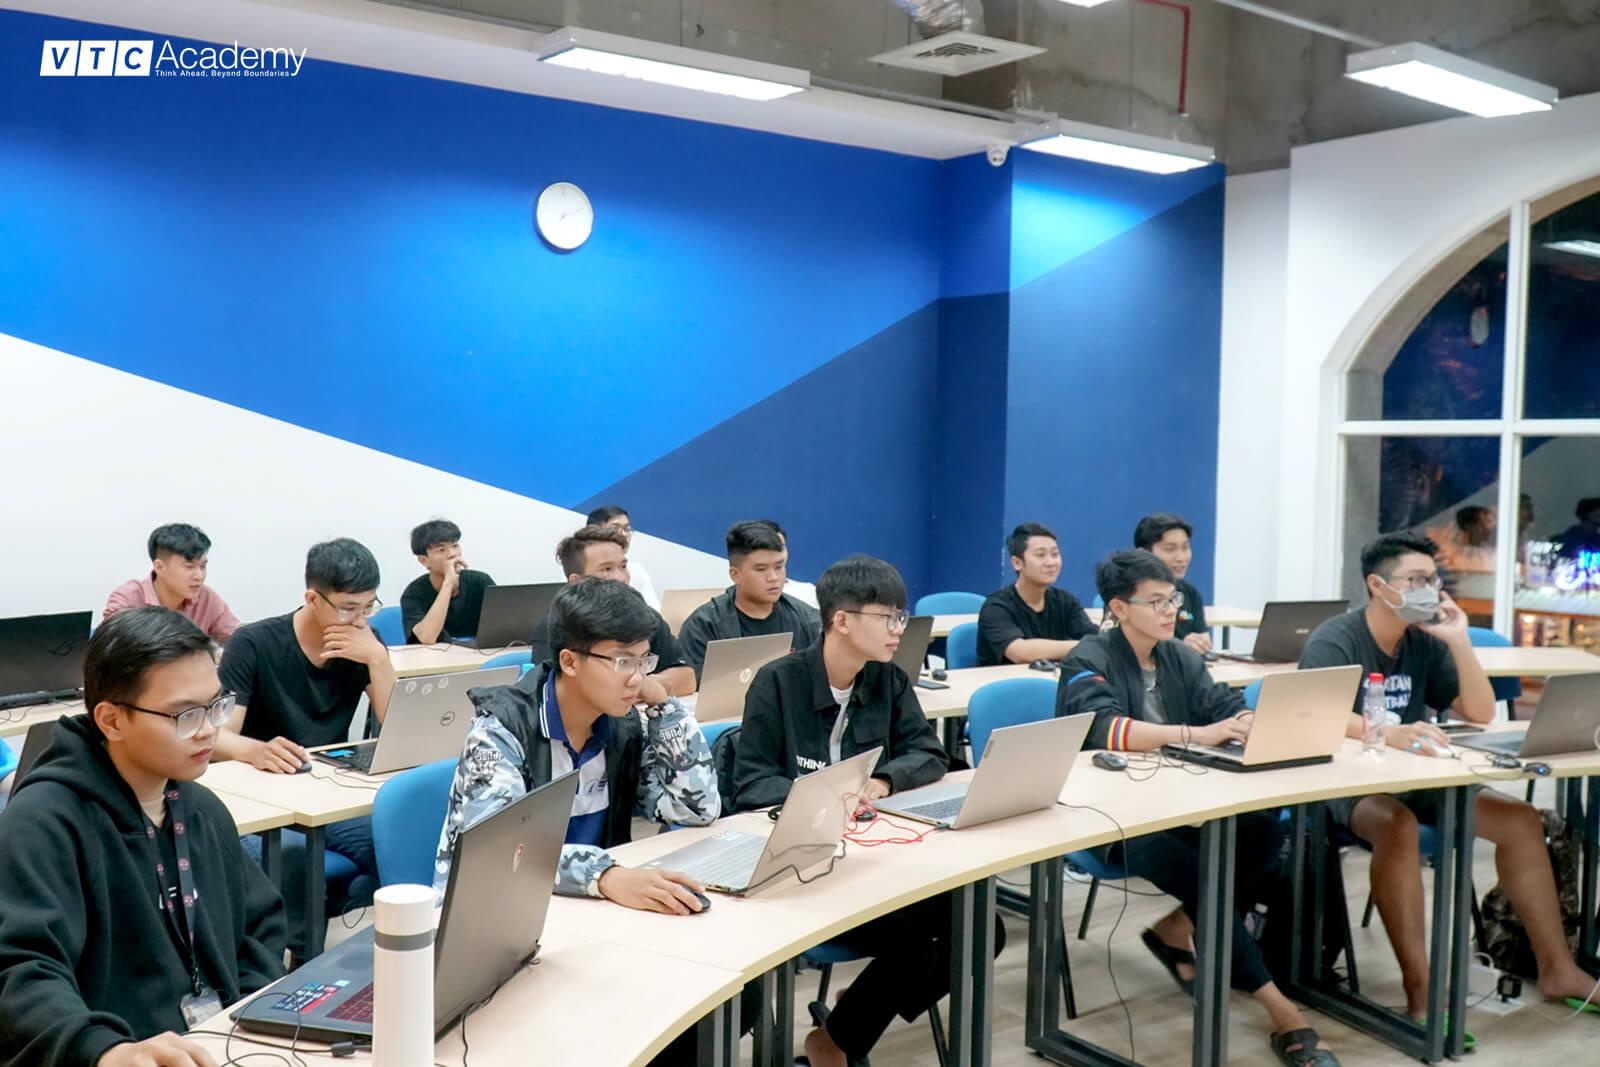 vtc-academy-hoc-thu-lap-trinh-game-4